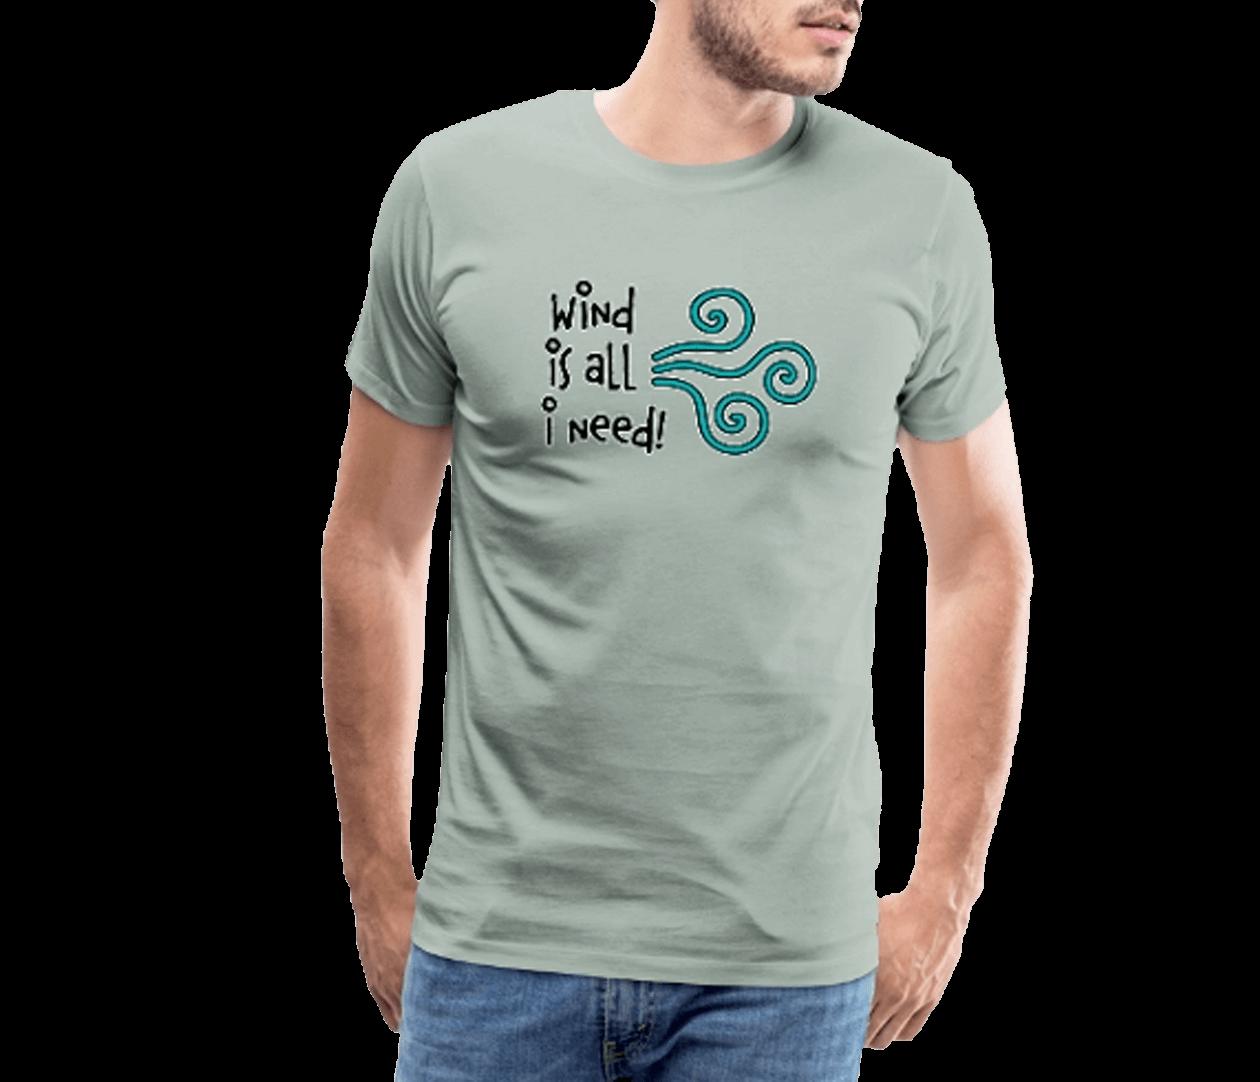 Wind is all - Männer Premium T-Shirt